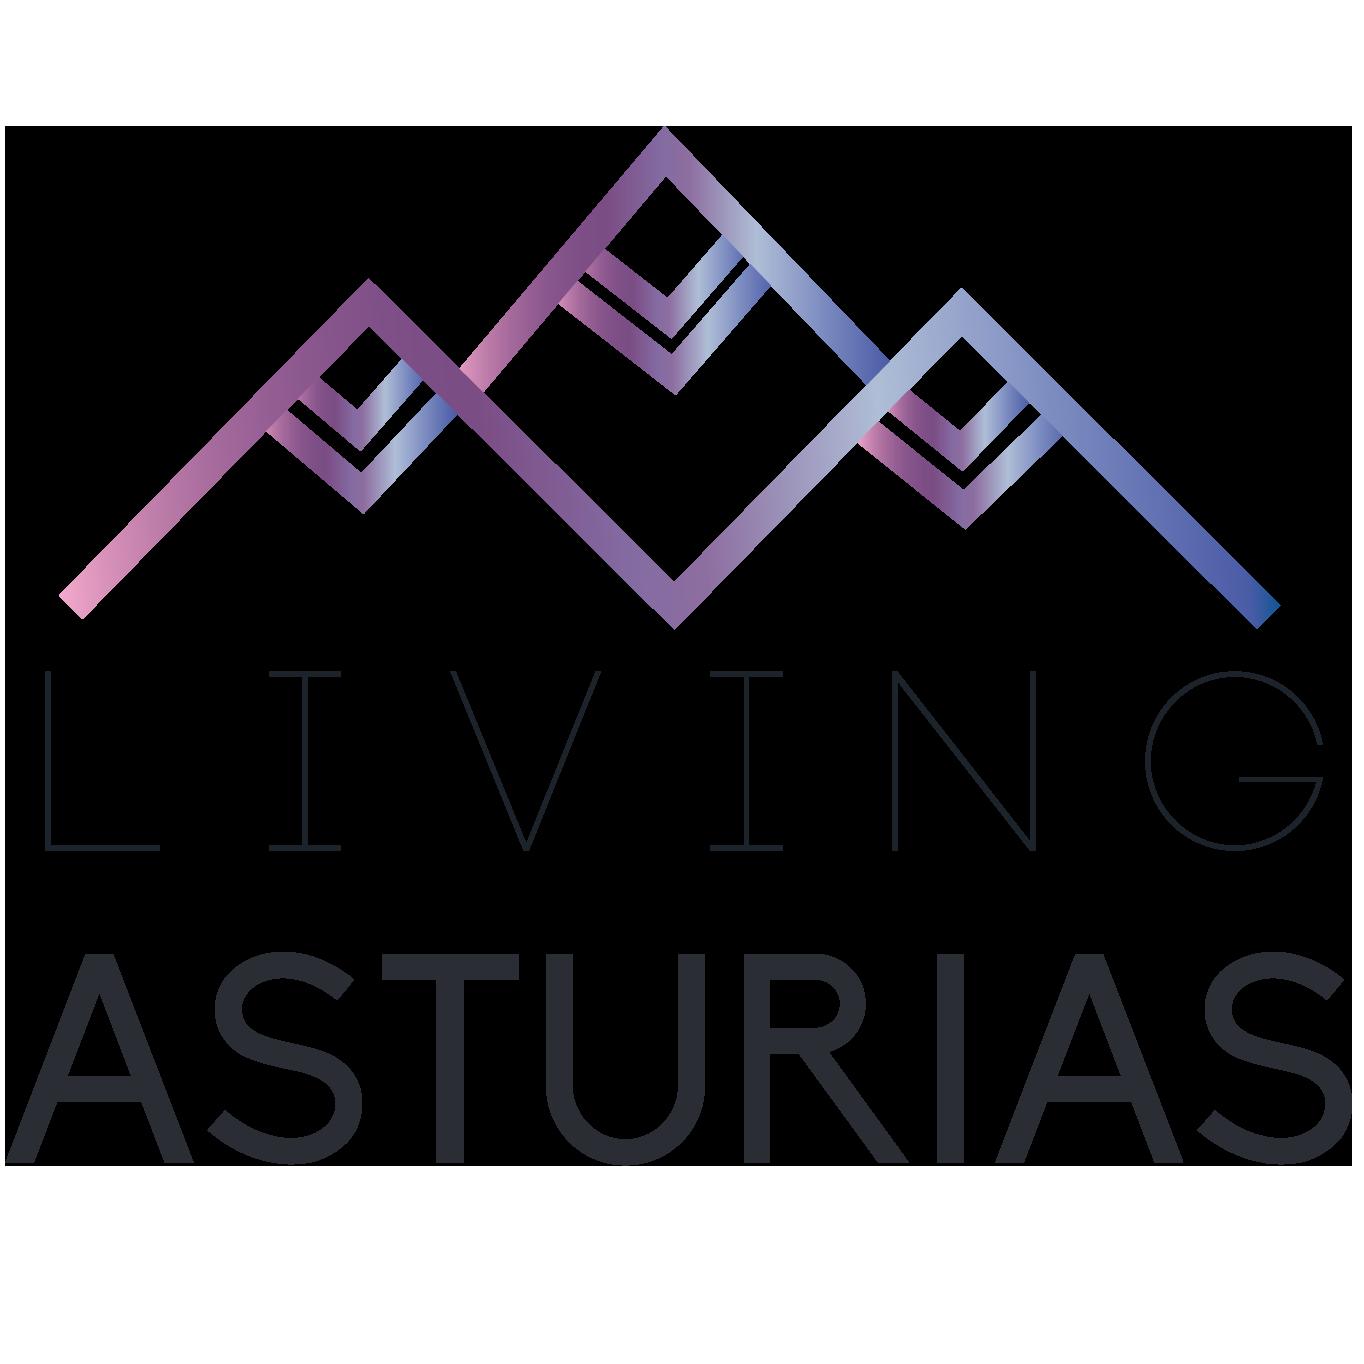 Locales logo